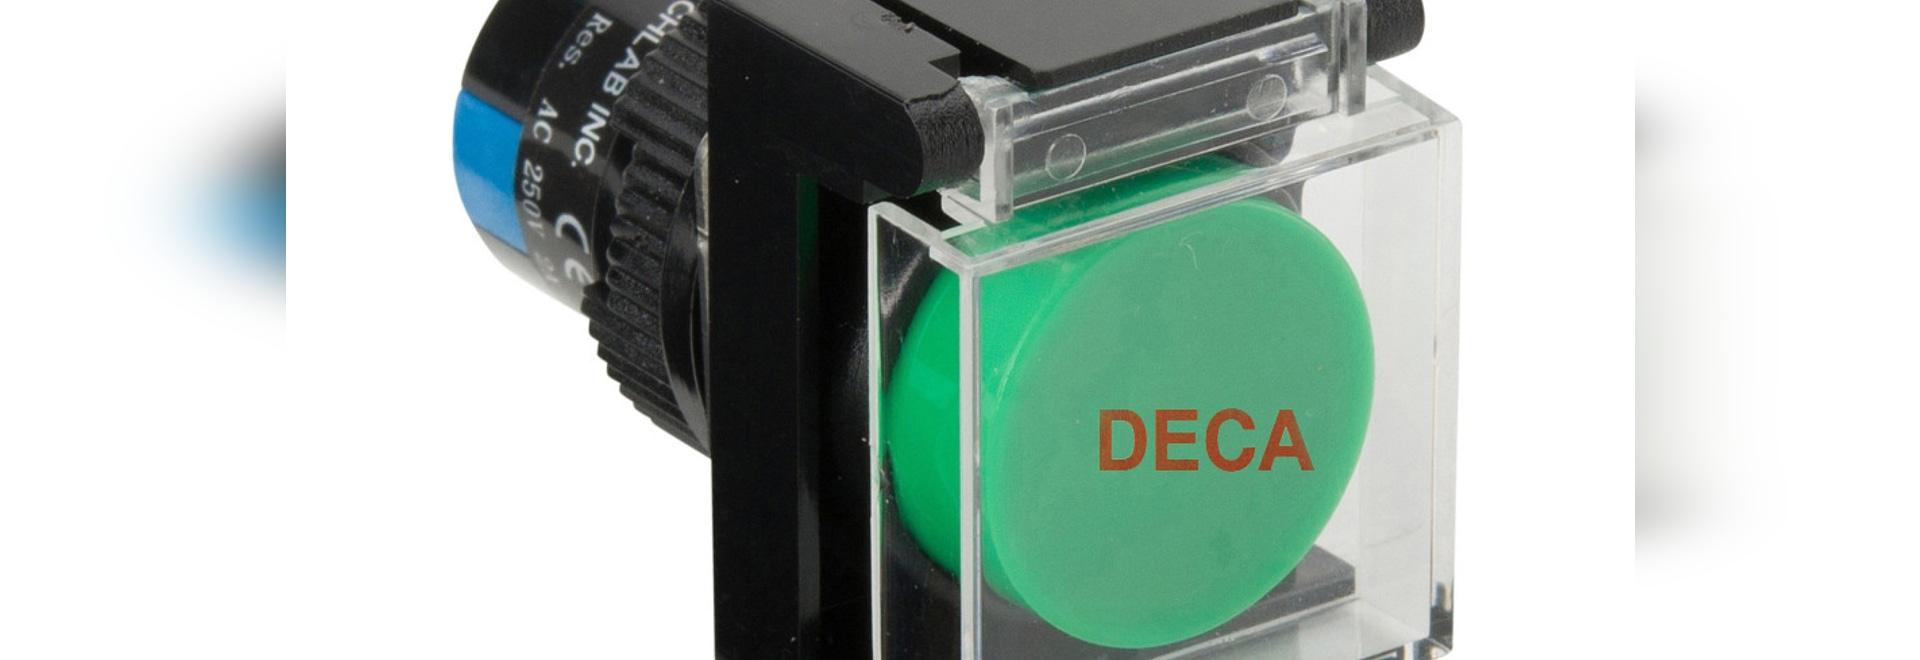 Botones Φ16mm del acuerdo de DECA